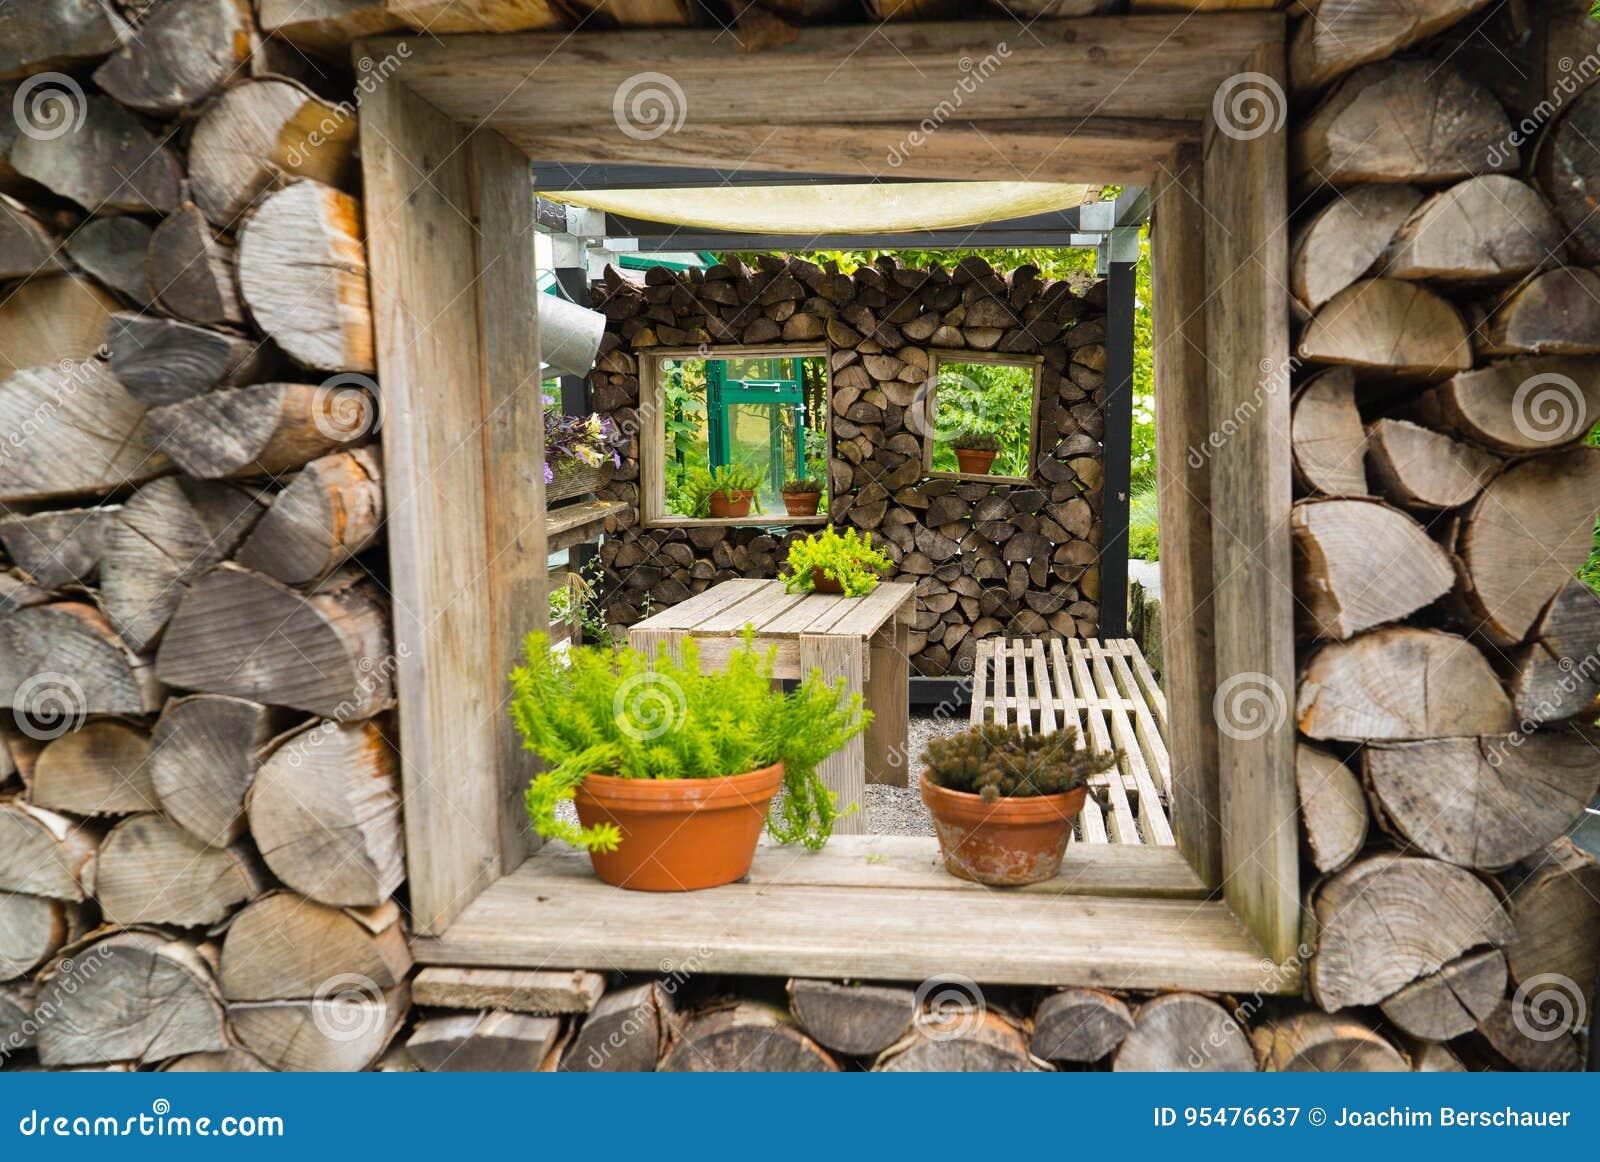 Dekoration Des Hauses Vom Brennholz Stockbild - Bild von zaun ...